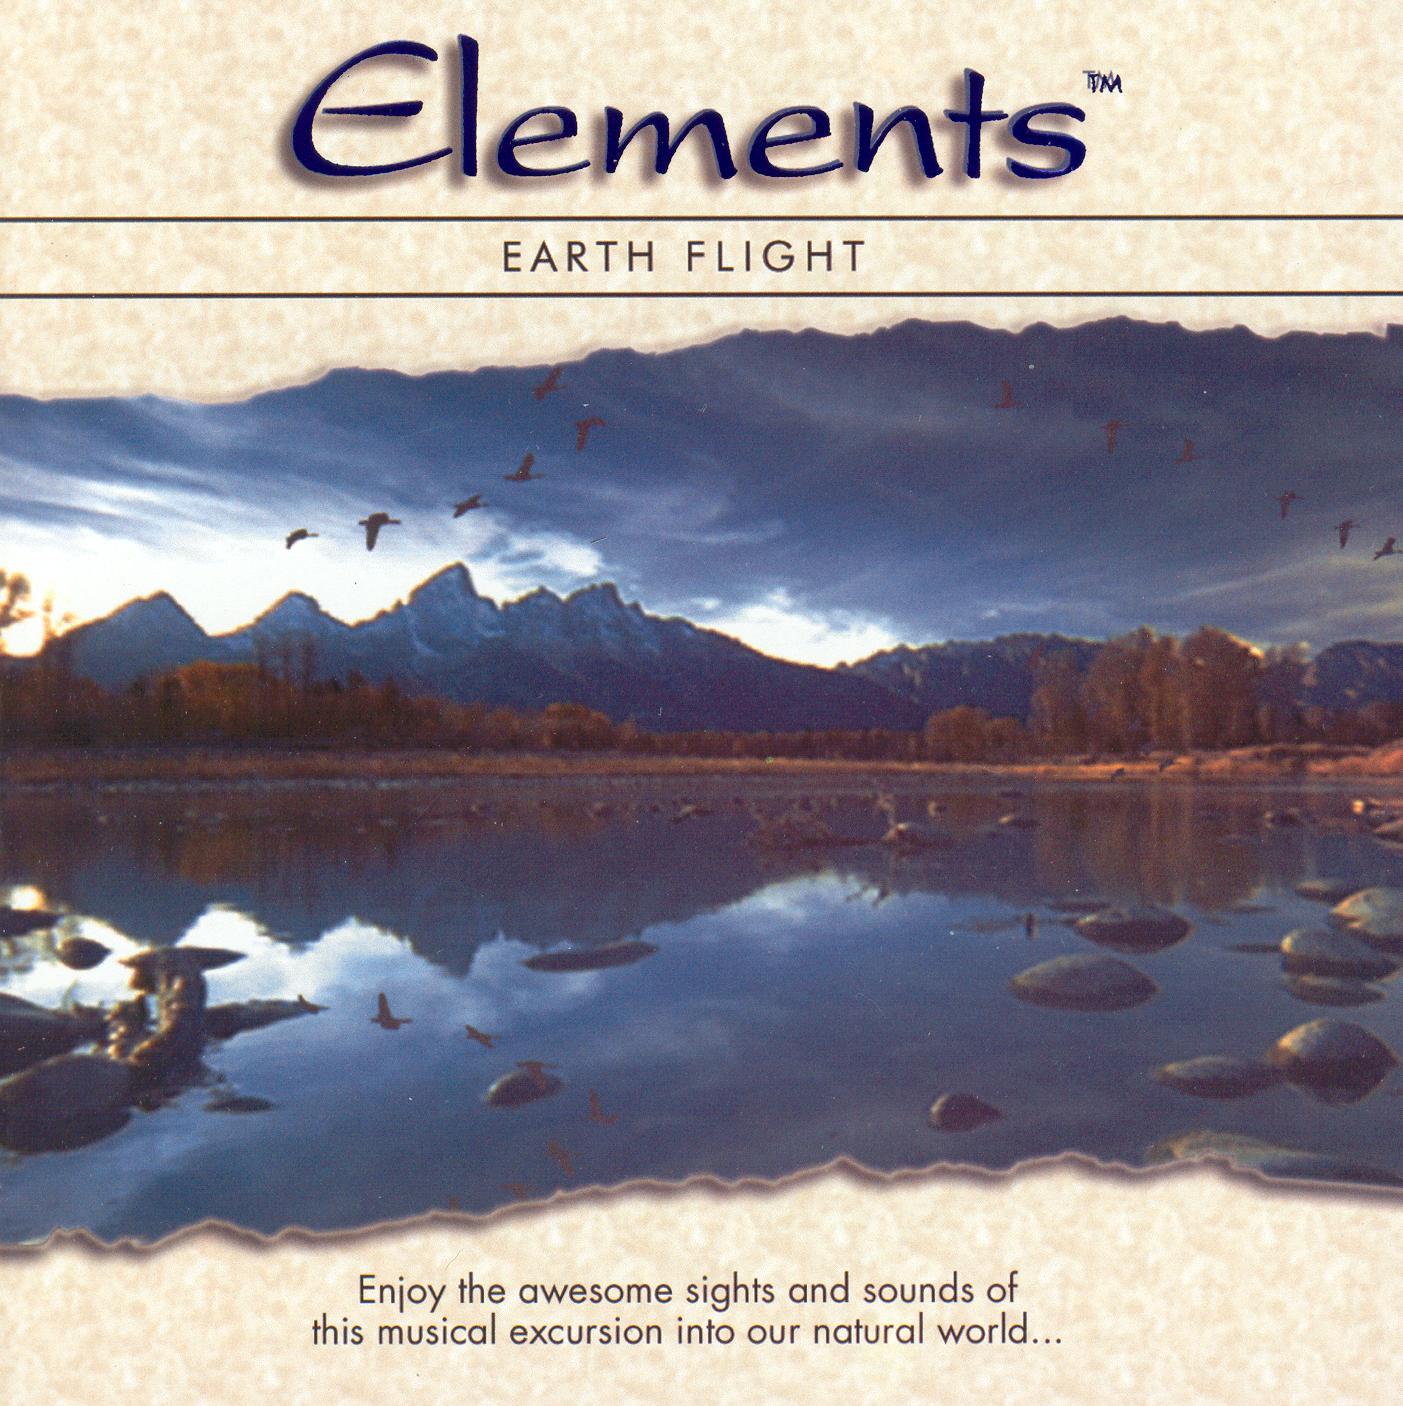 Elements: Earth Flight